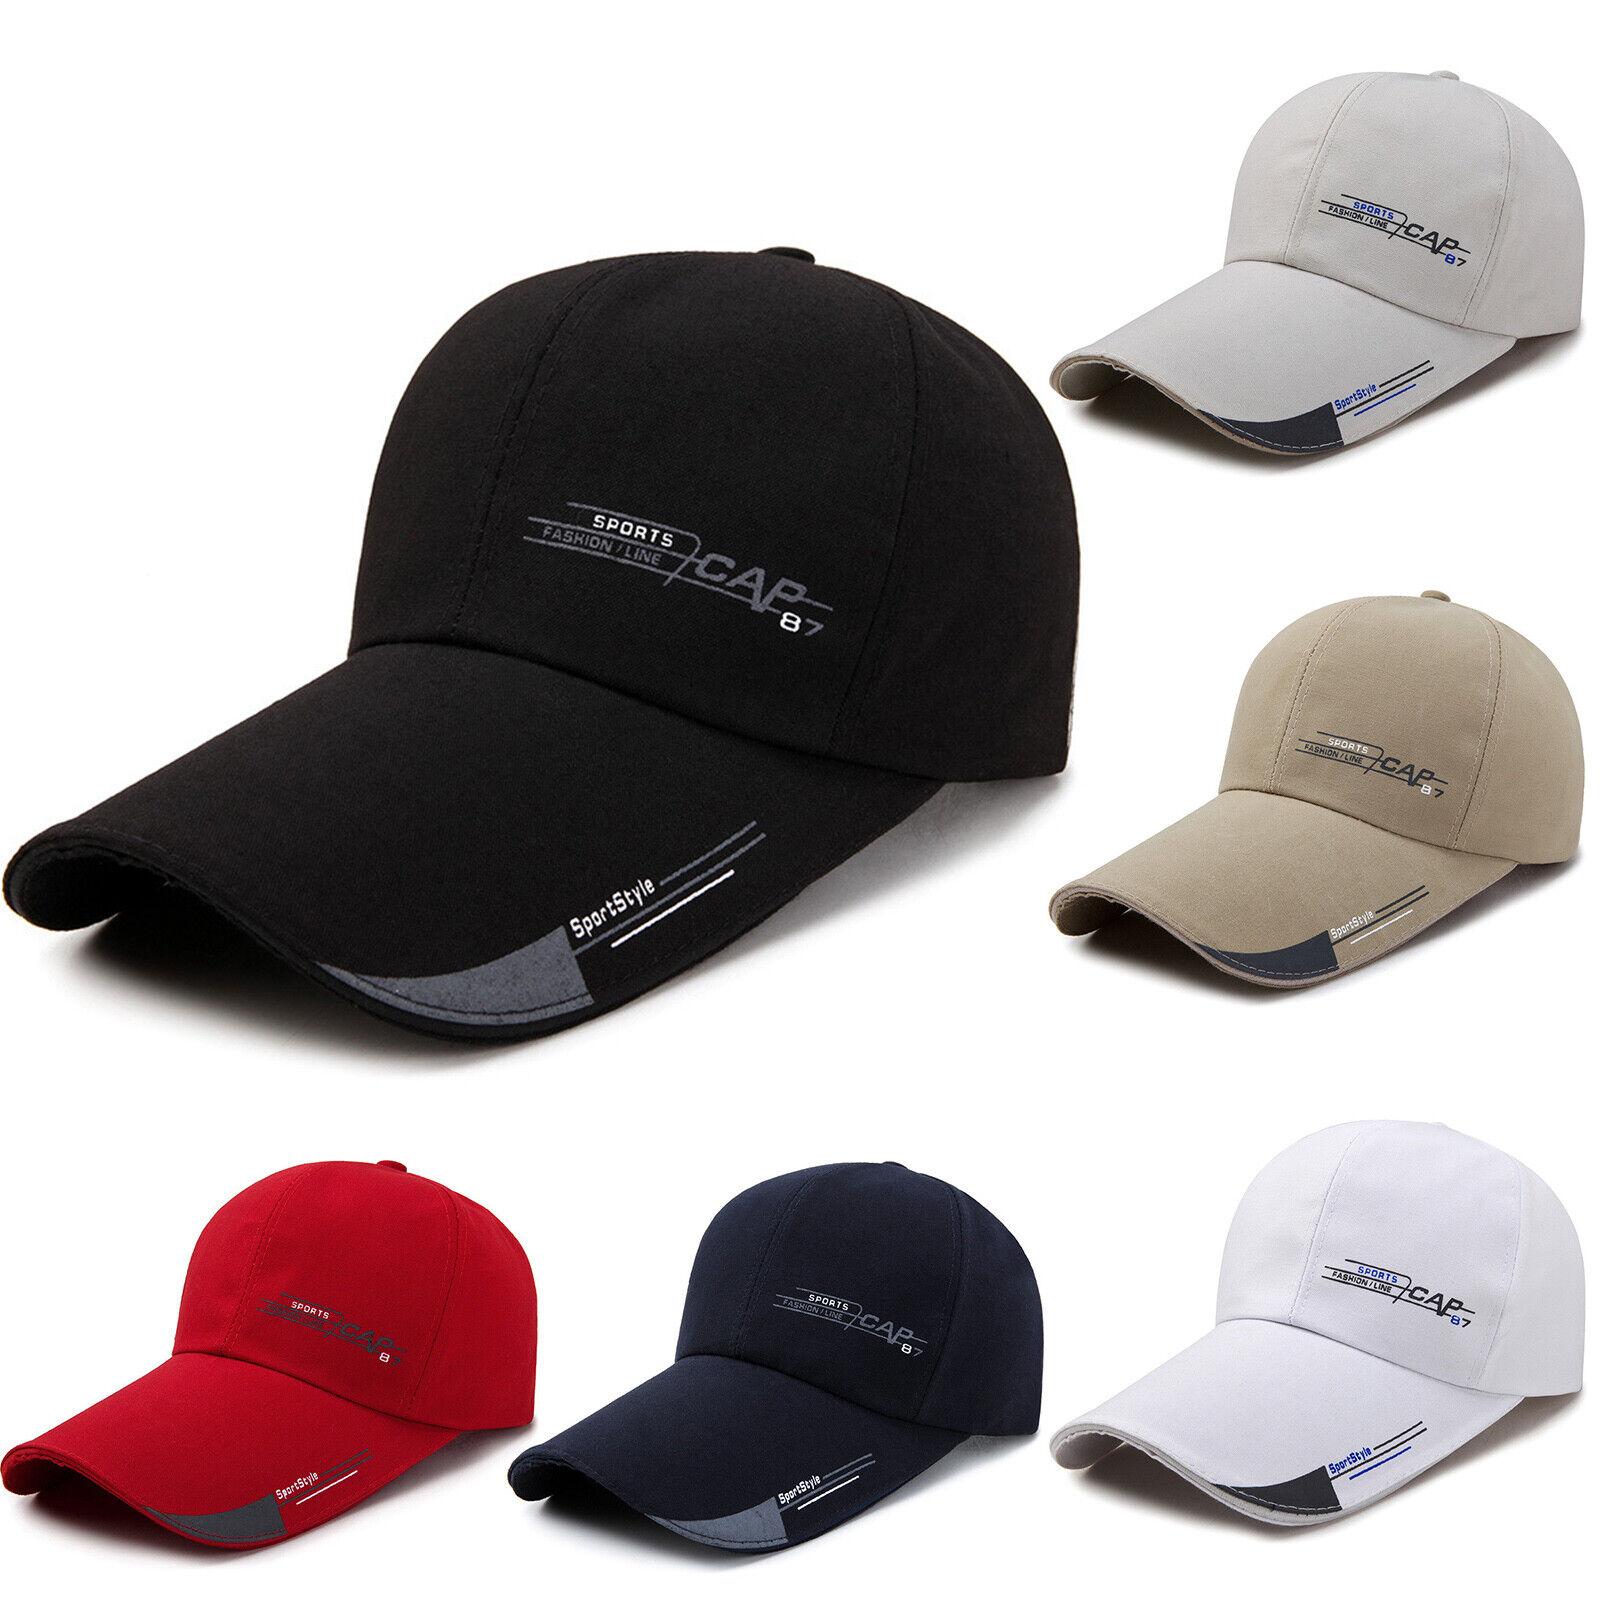 Herren Damen Snapback Kappe Mütze Cap Basecap Cappy Trucker Städte Sonnenhüt.